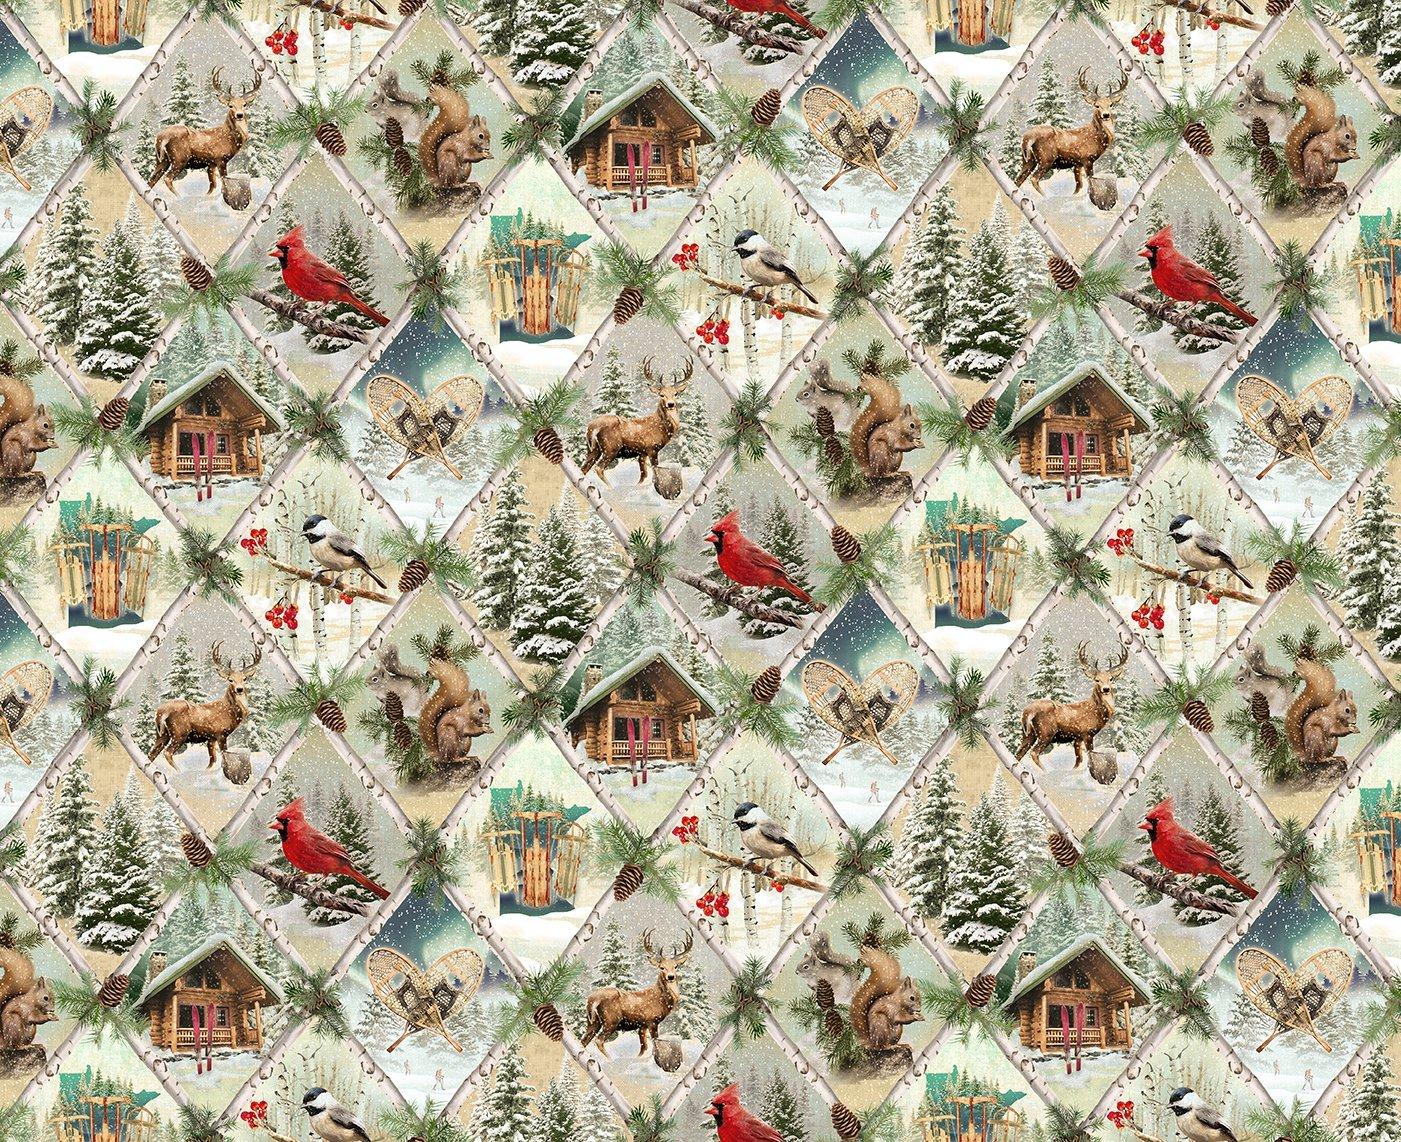 Quilt Minnesota 2021 Digital Nature Scenes LIght Caramel Y3314-64